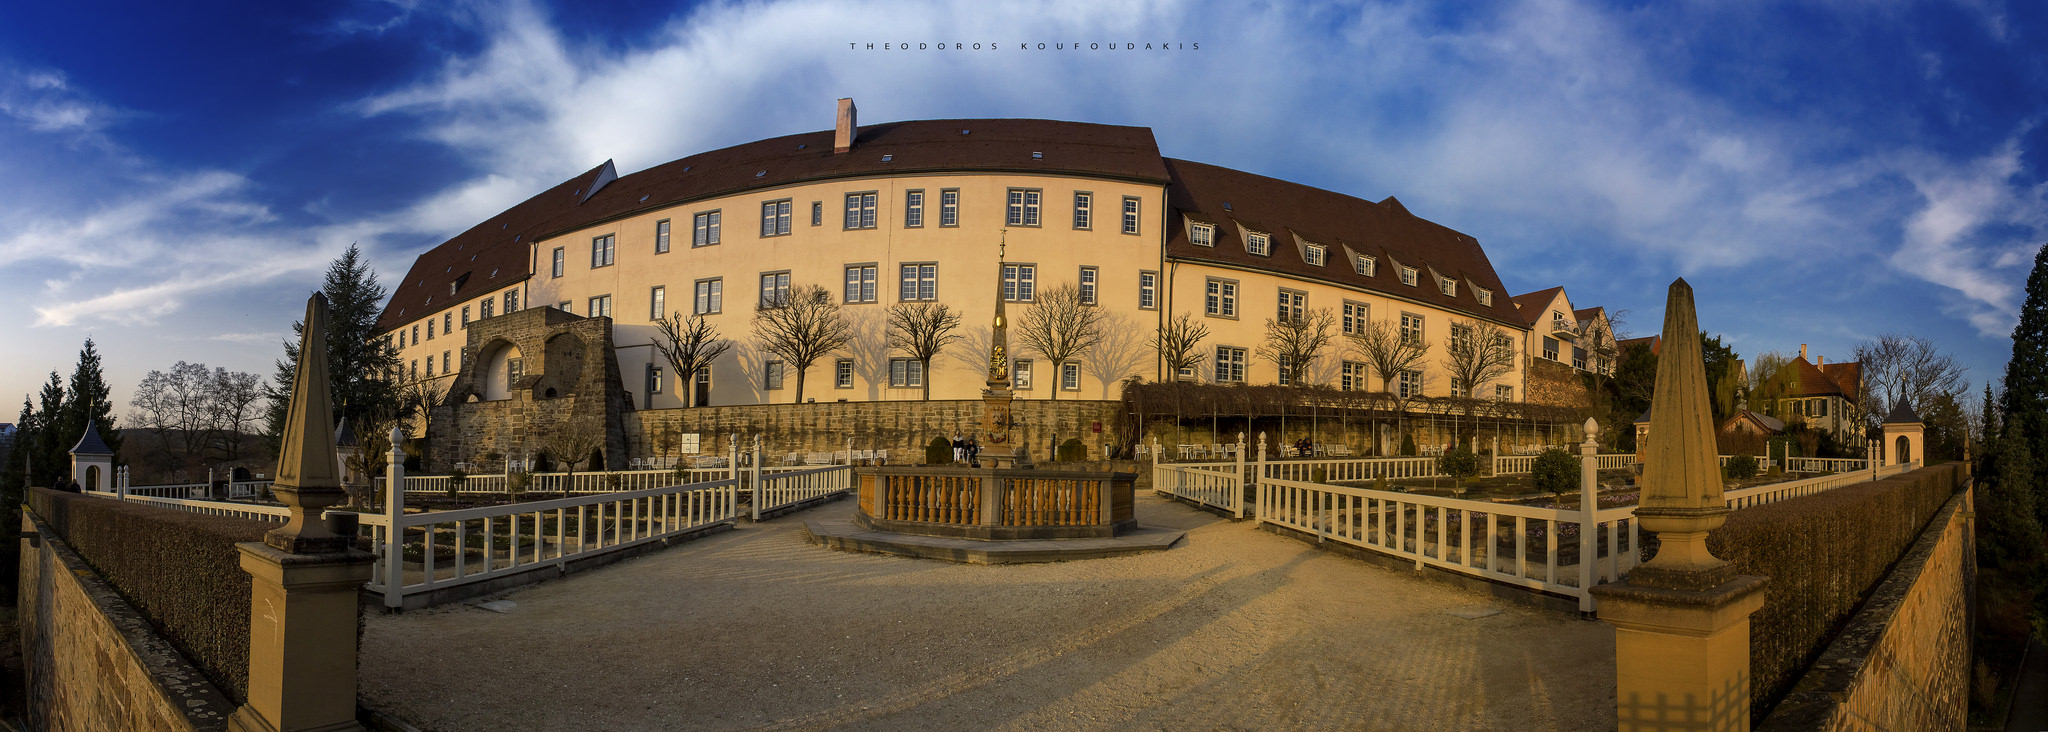 pomeranzengarten-leonberg-2